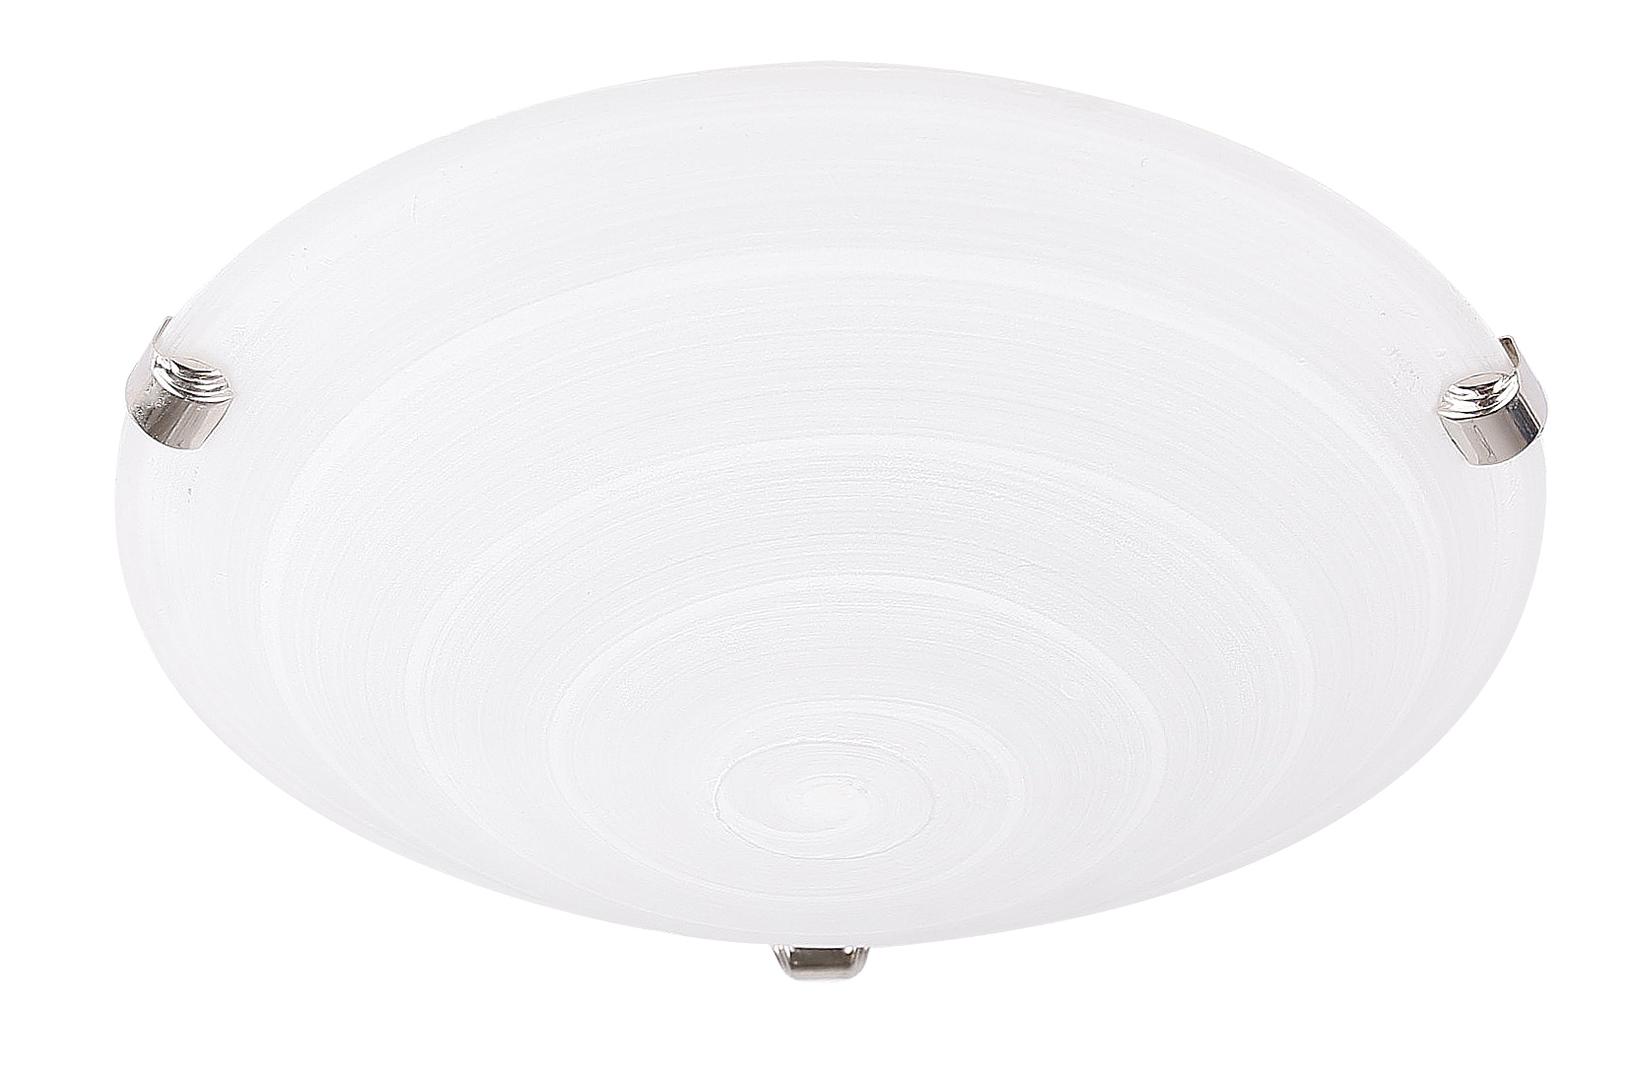 Lampa Plafon Plafon 30 Flou 3843 1X60W E27